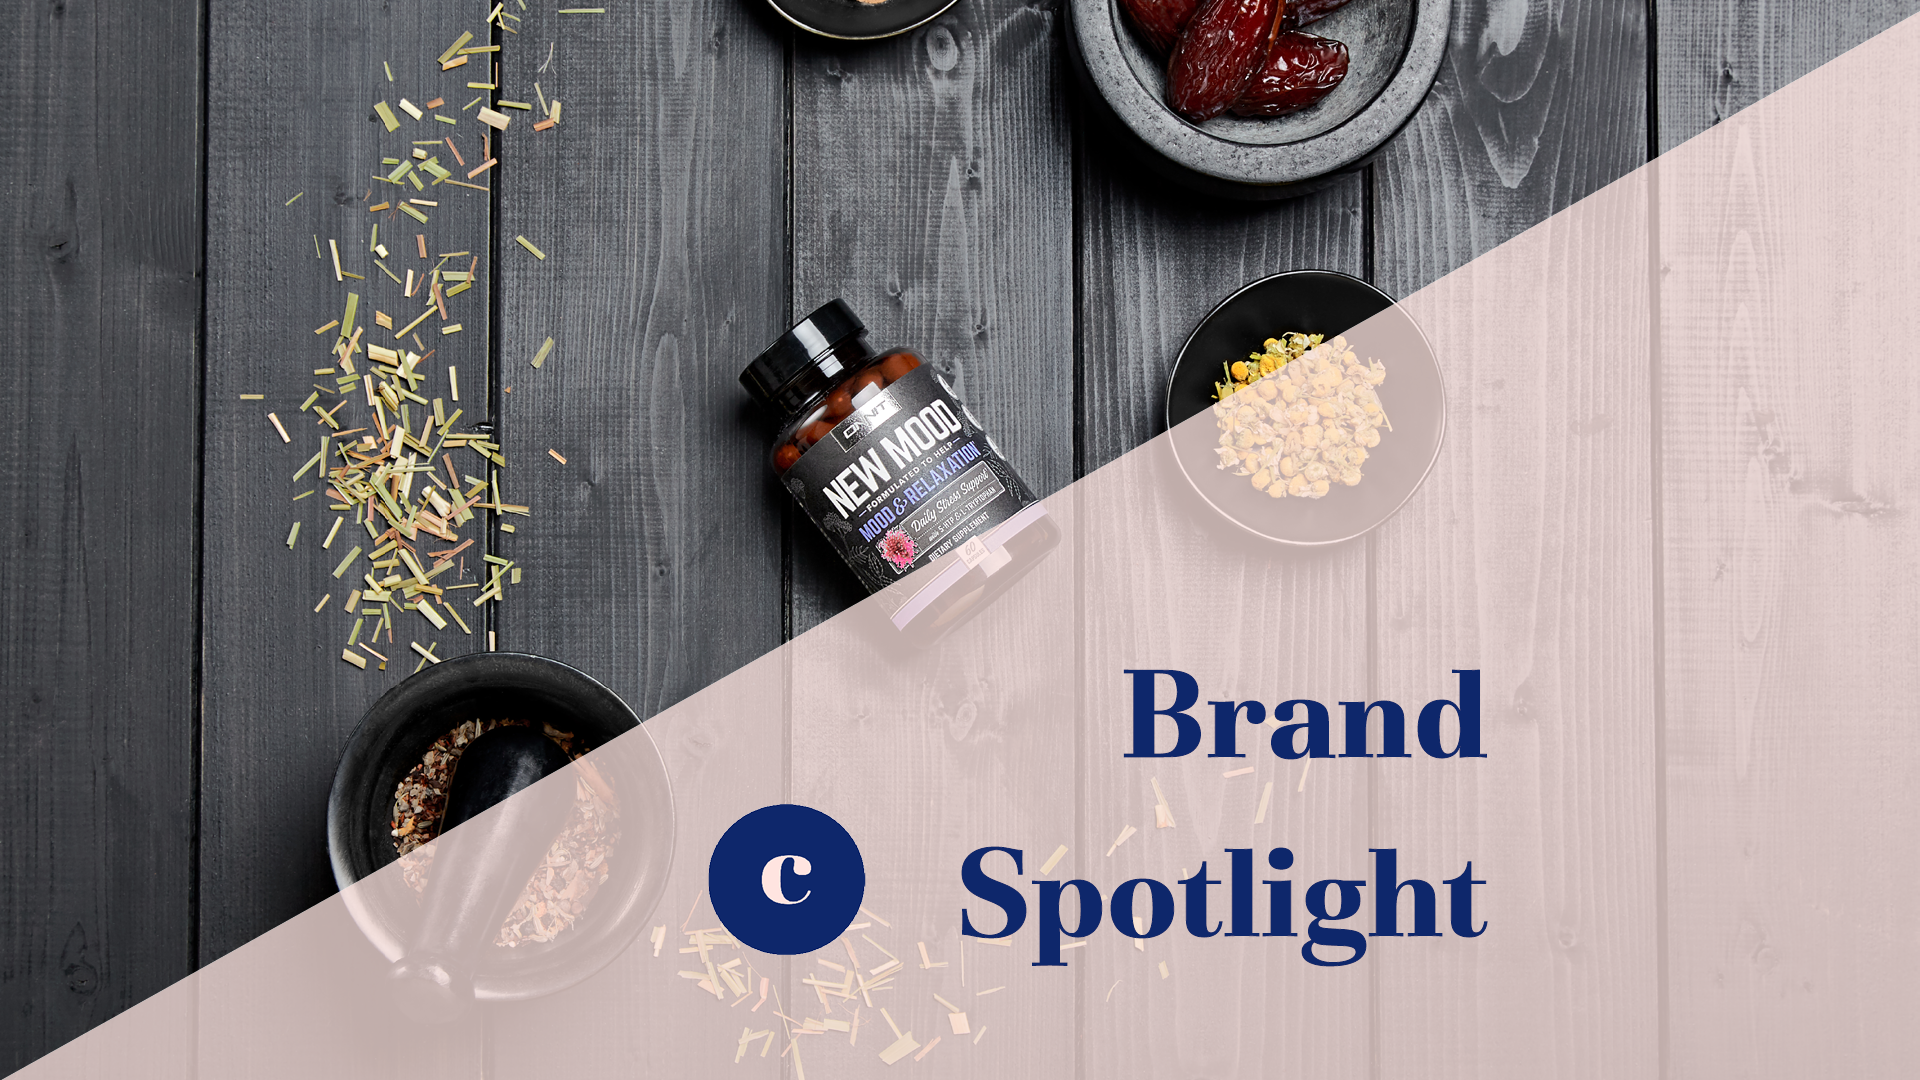 Brand Spotlight. ONNIT - New Mood.